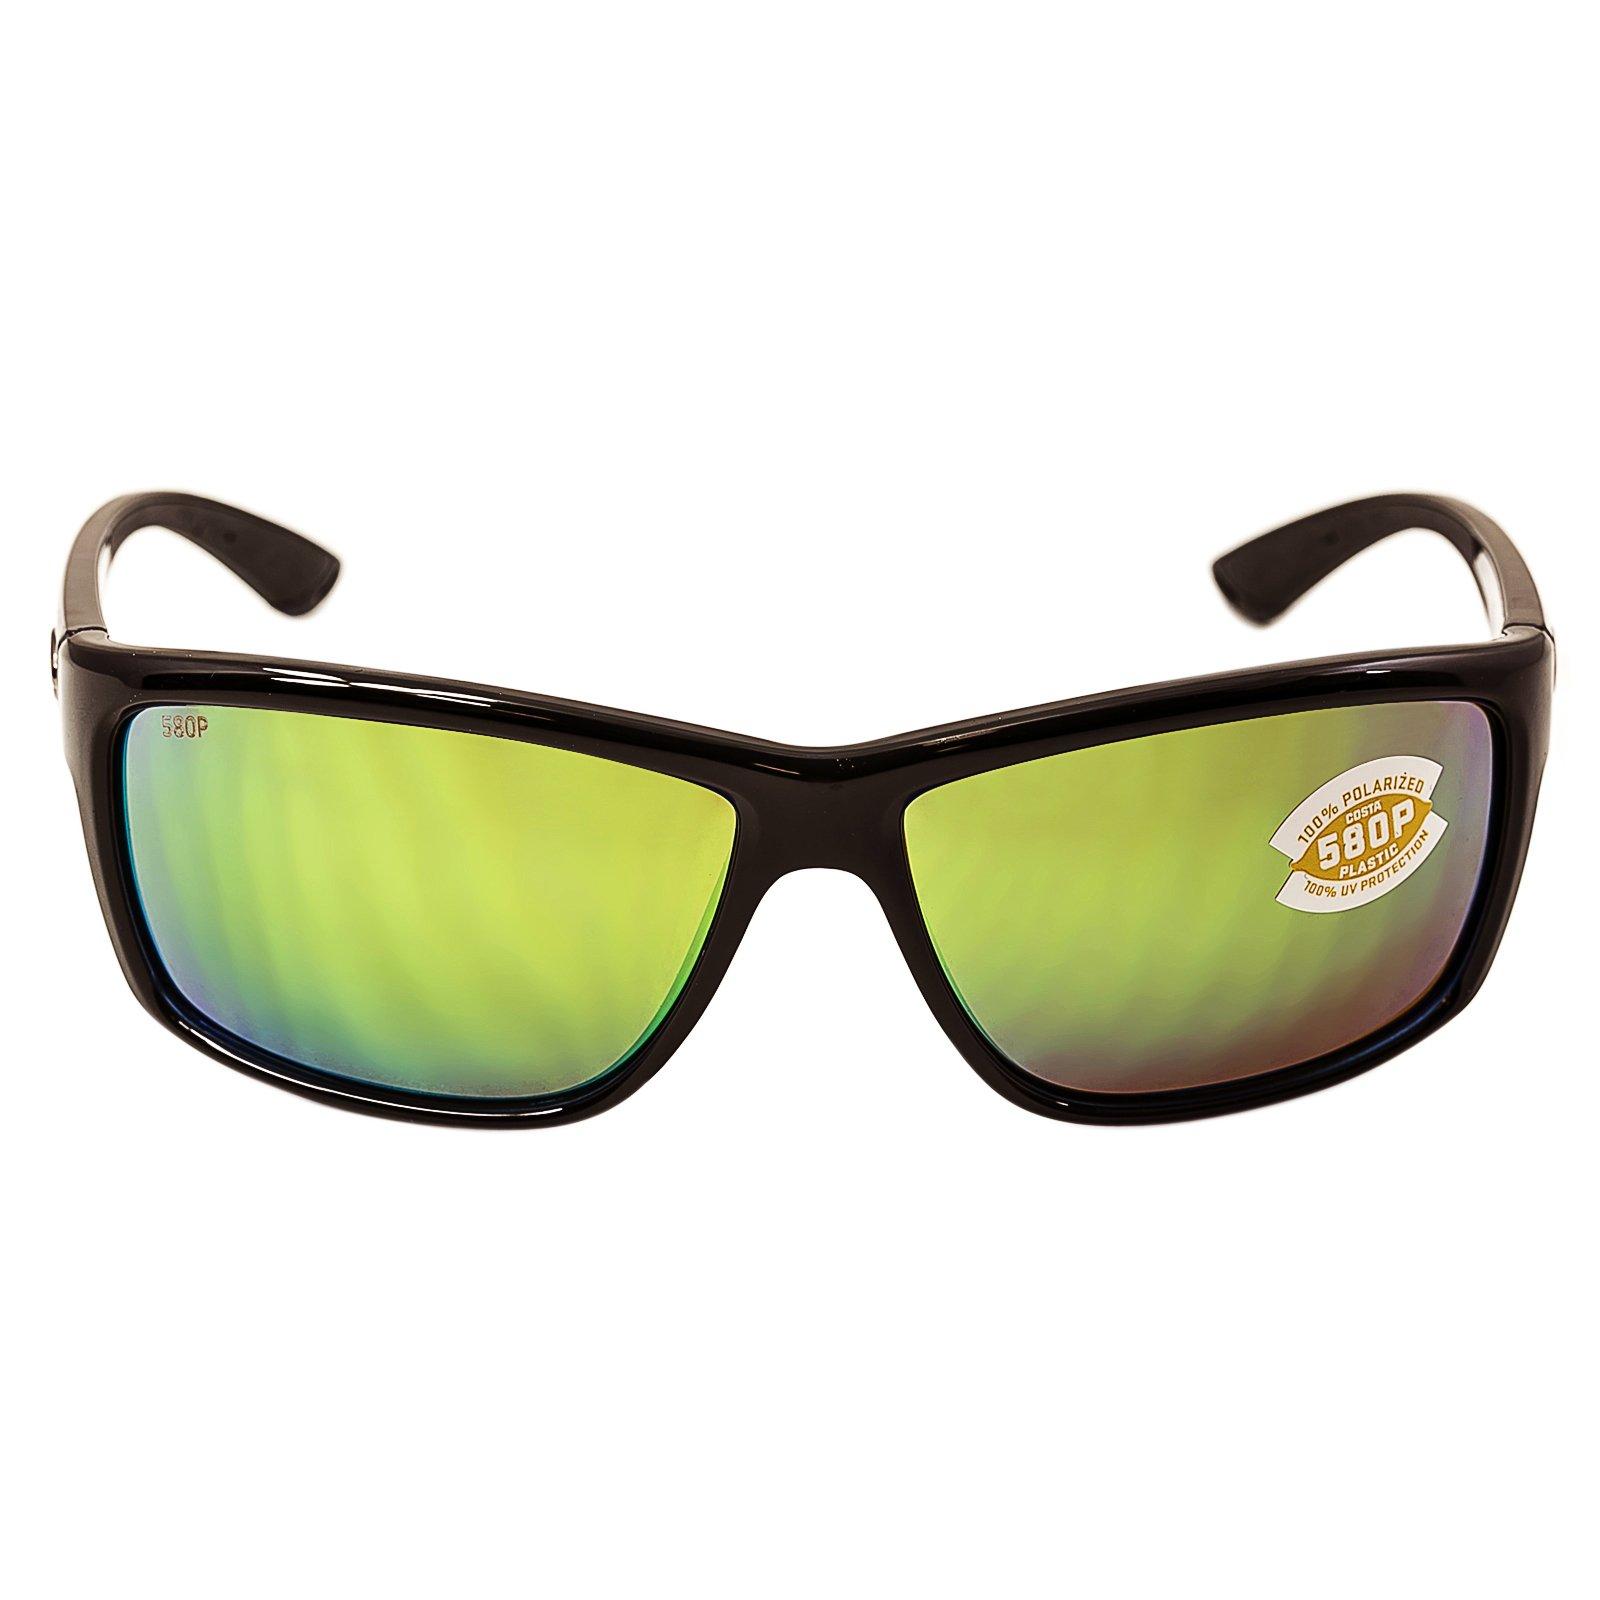 Costa Del Mar Mag Bay Sunglasses, Shiny Black, Green Mirror 580P Lens by Costa Del Mar